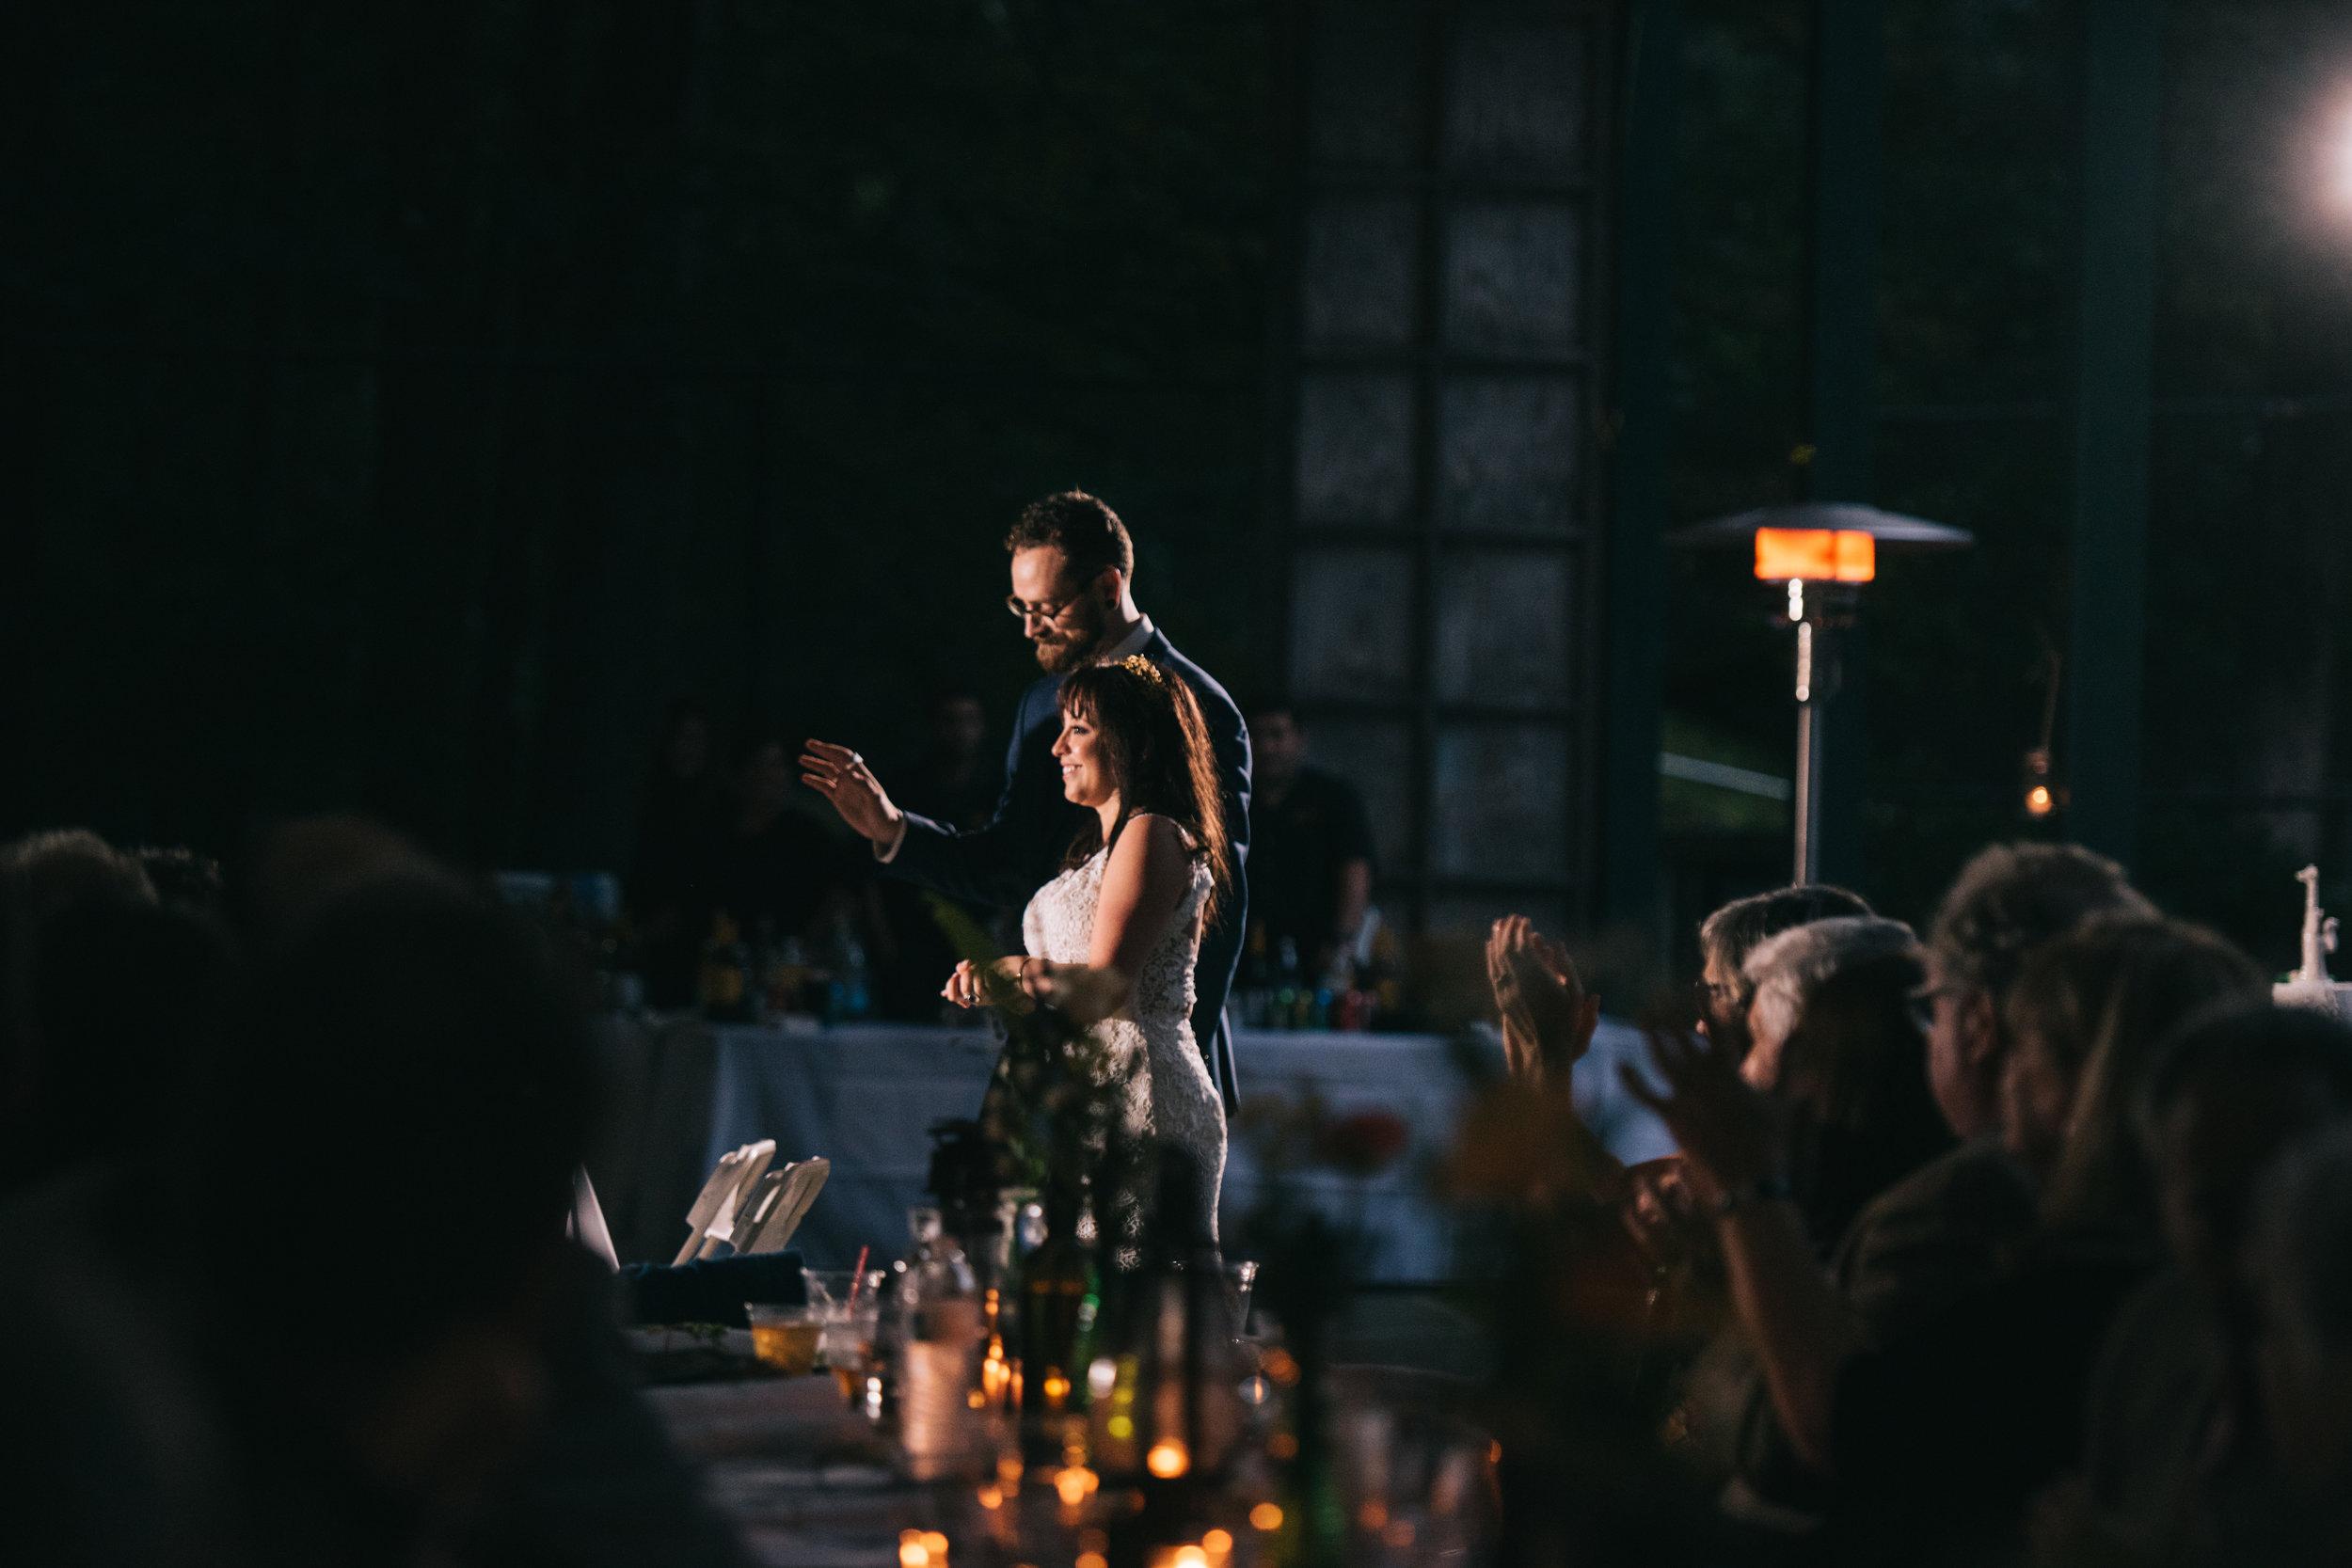 WeddingPhotos | NJPhotographer | Highlights-15-4.jpg